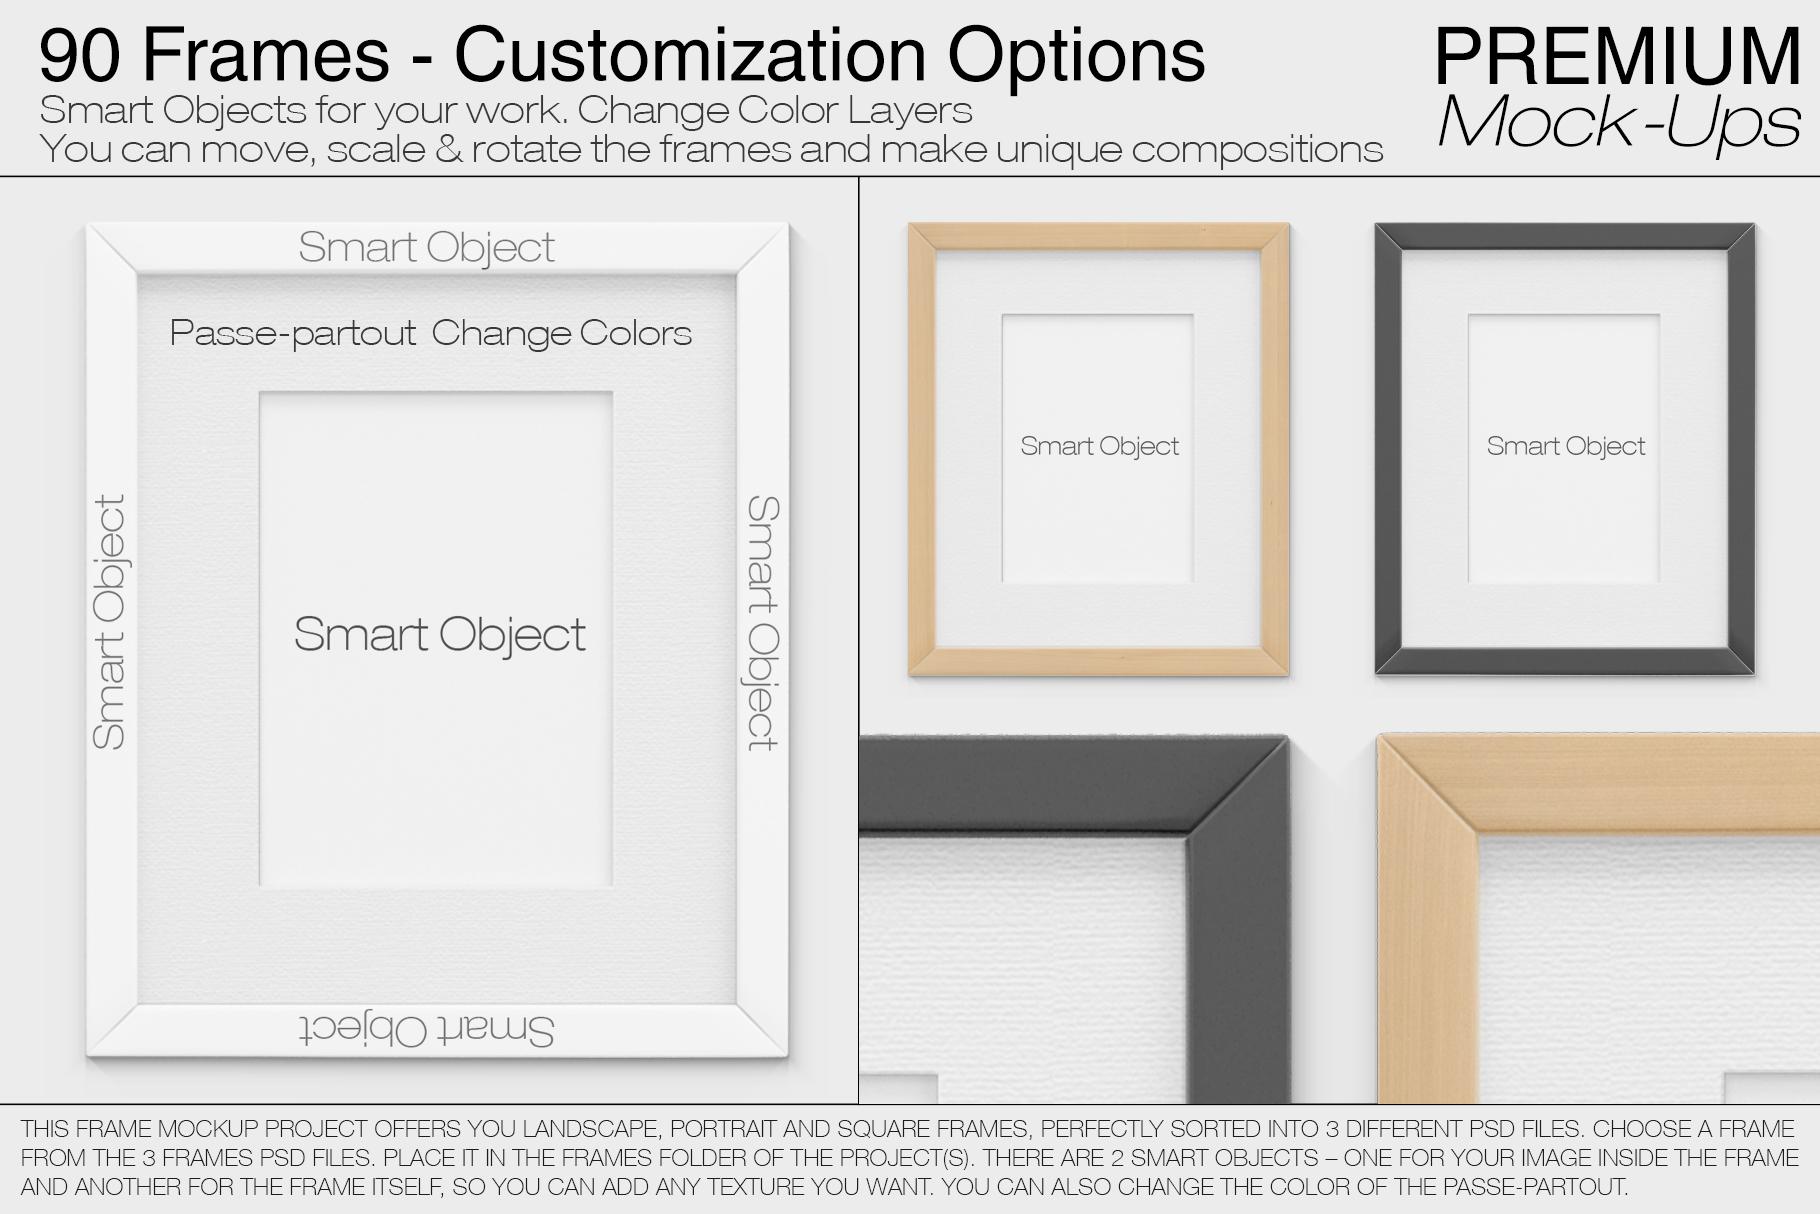 Pillows & Frames Mockup Set example image 4